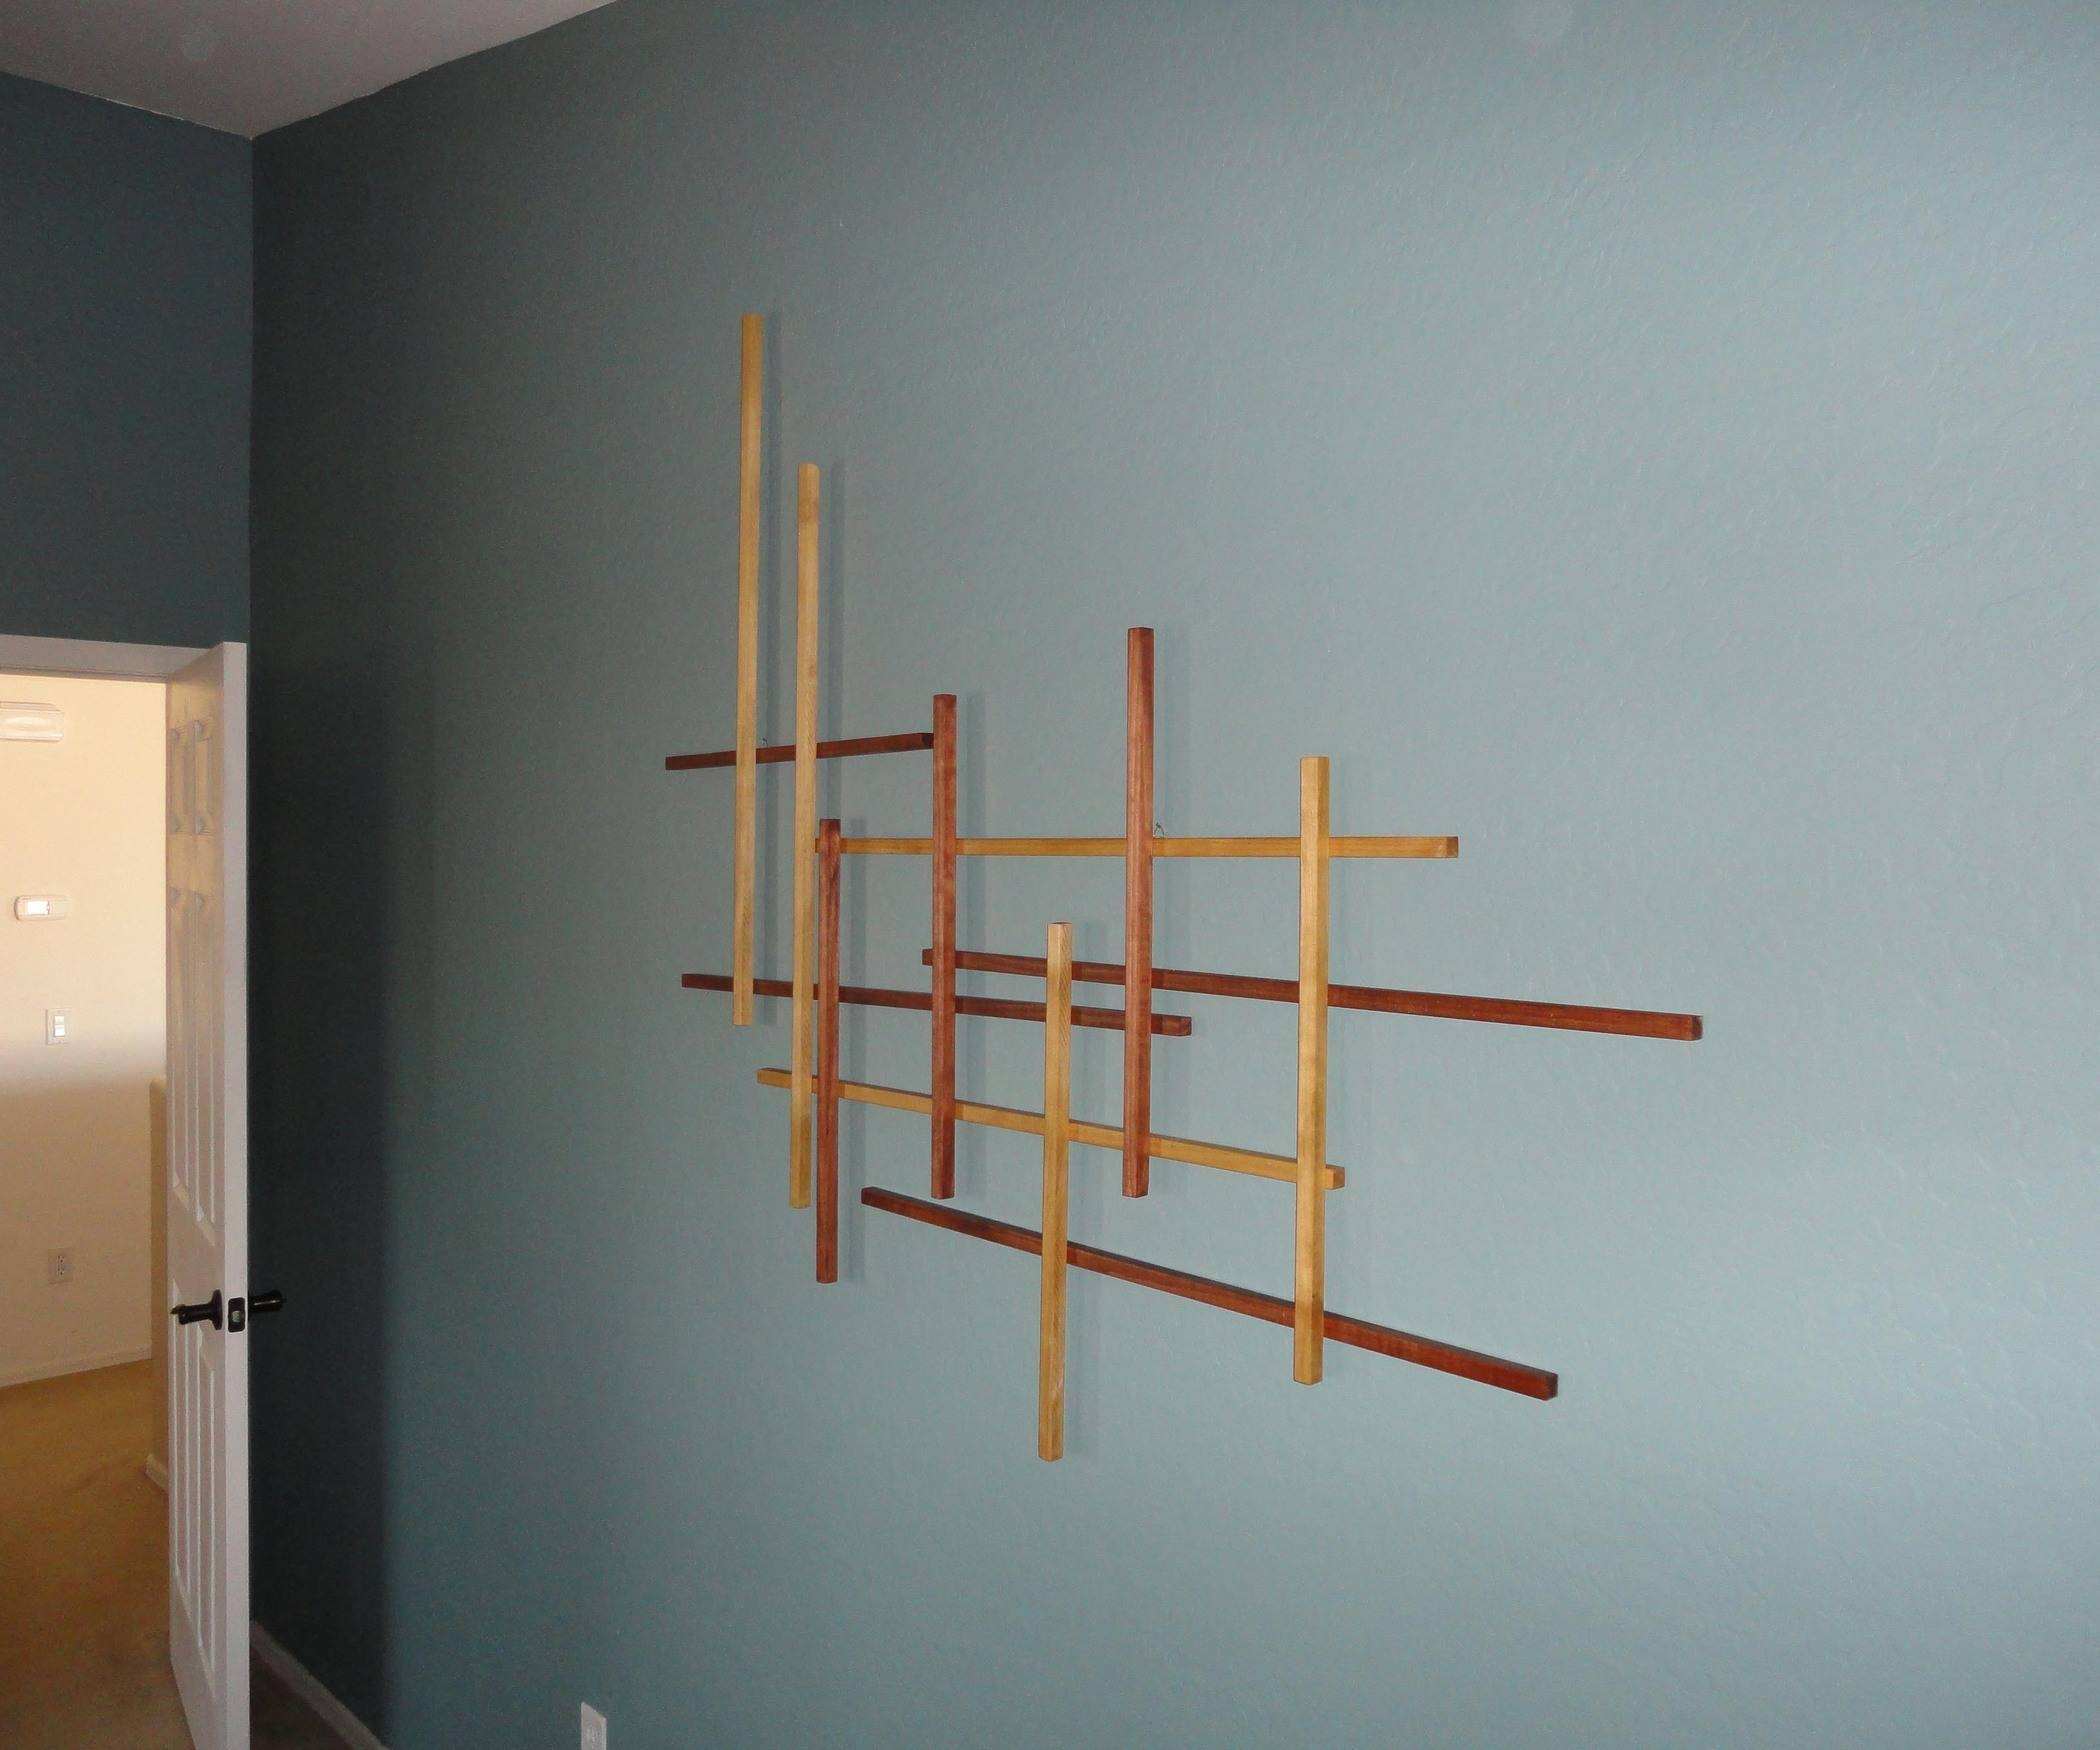 Art: Homemade Wall Art Pertaining To Newest Homemade Wall Art (View 3 of 20)